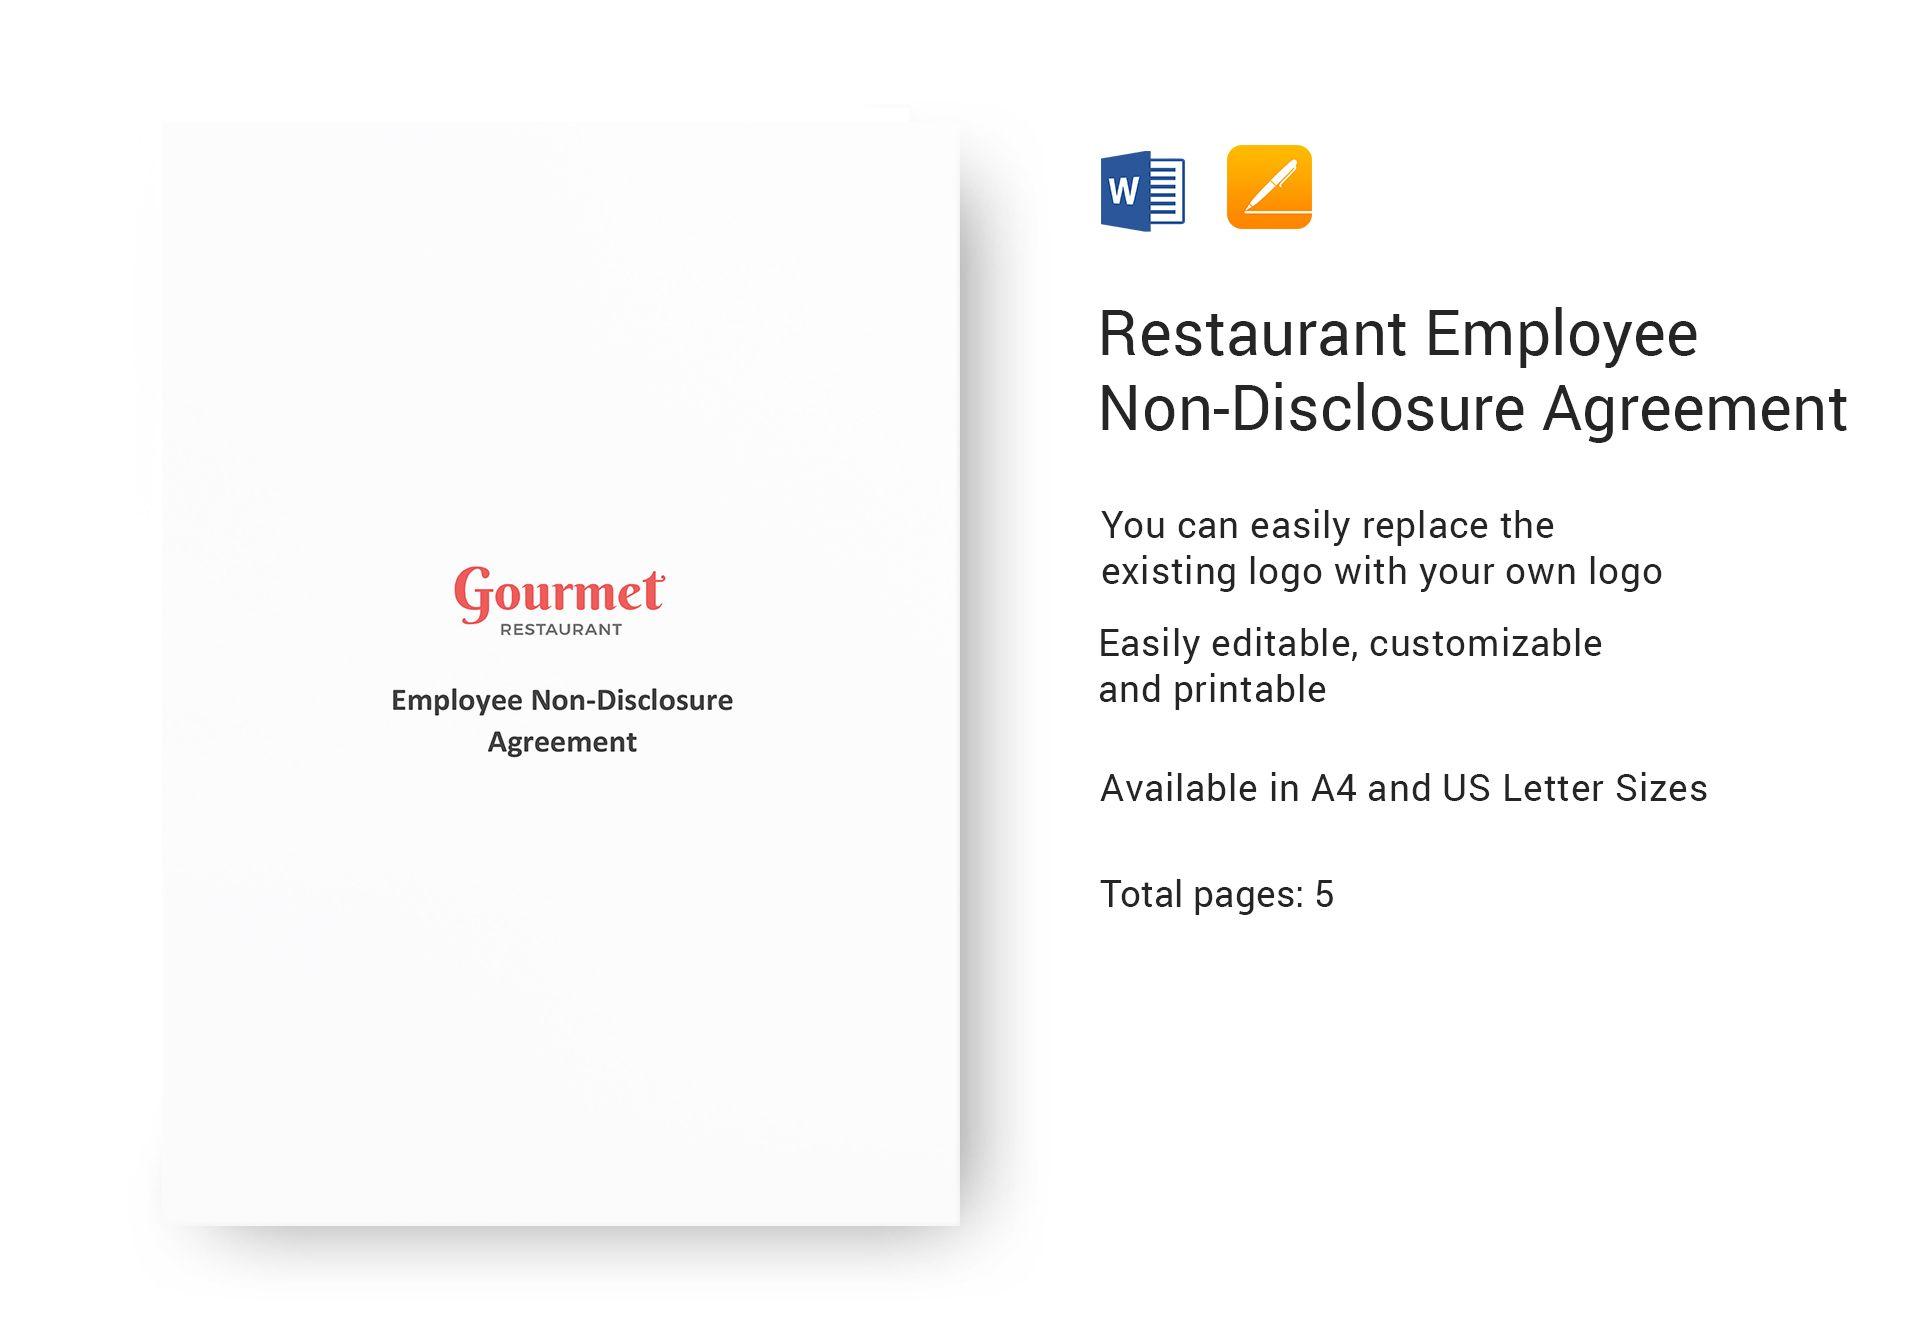 Restaurant Employee Non-Disclosure Agreement